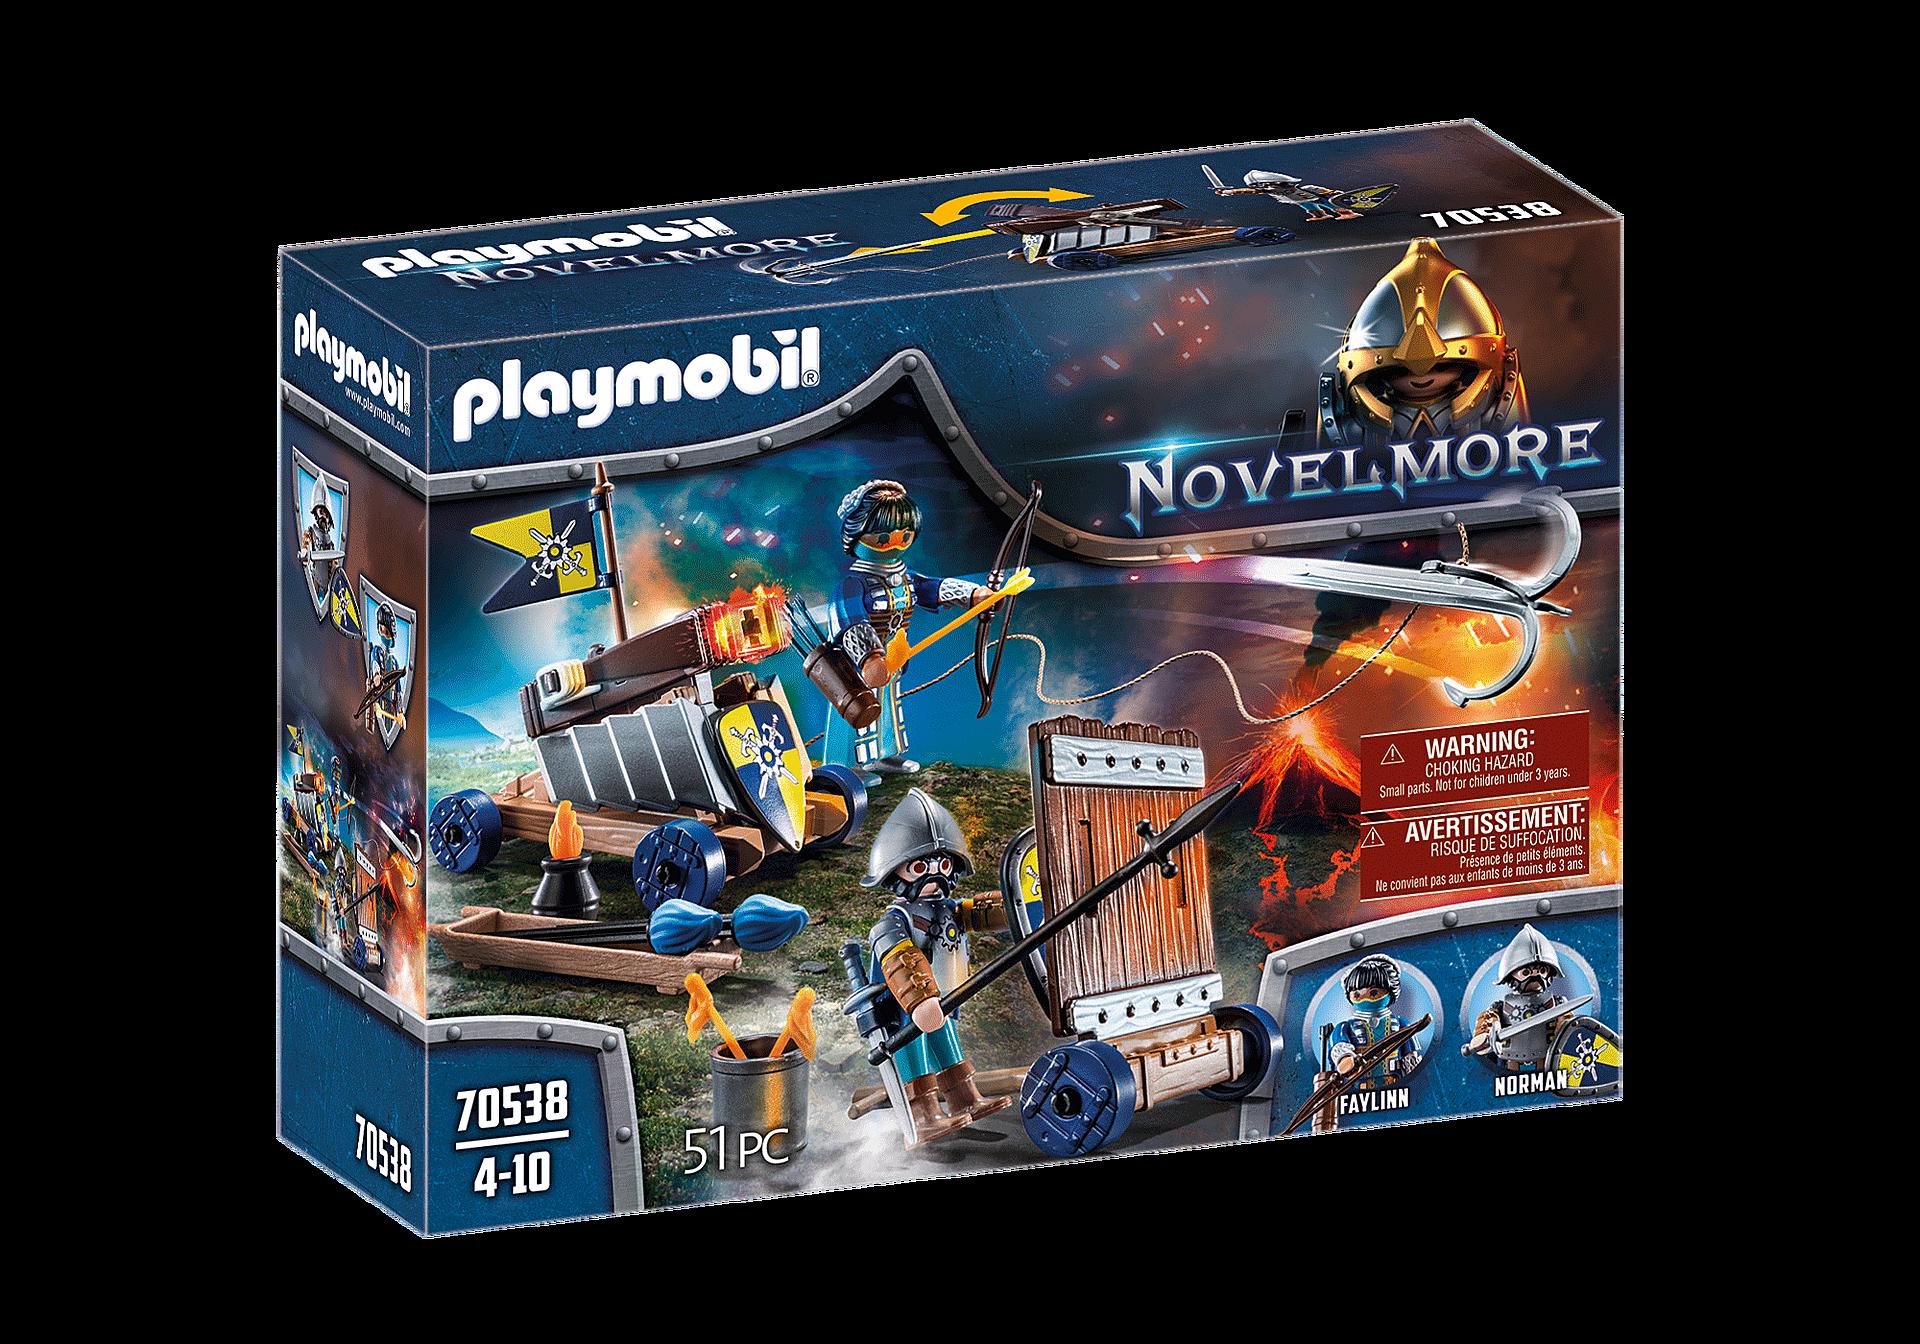 70538 Novelmore angrebstrop zoom image2